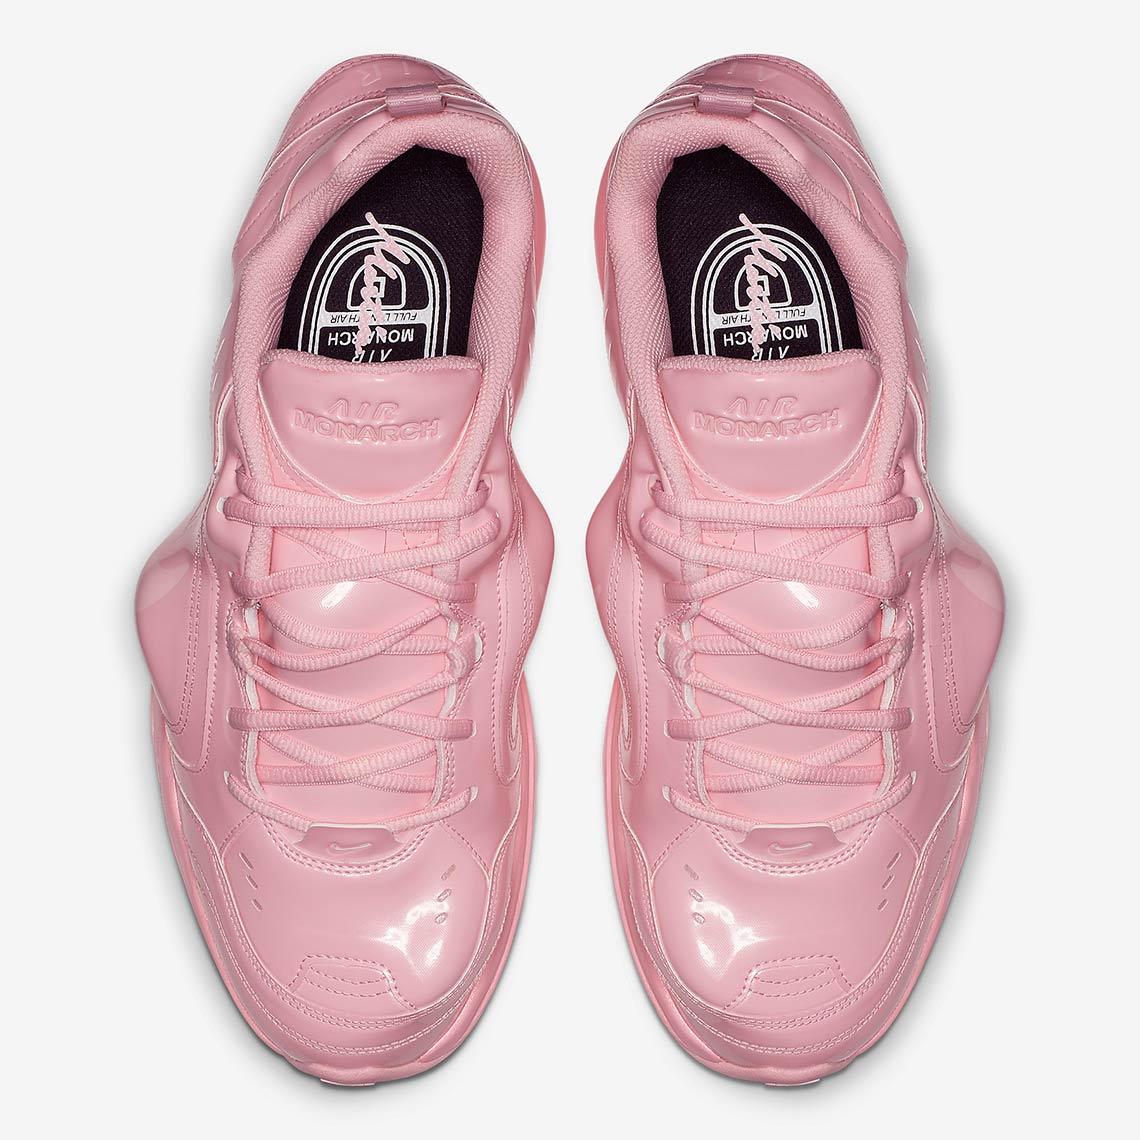 b185828874b Martine Rose x Nike Air Monarch IV Release Date  January 12